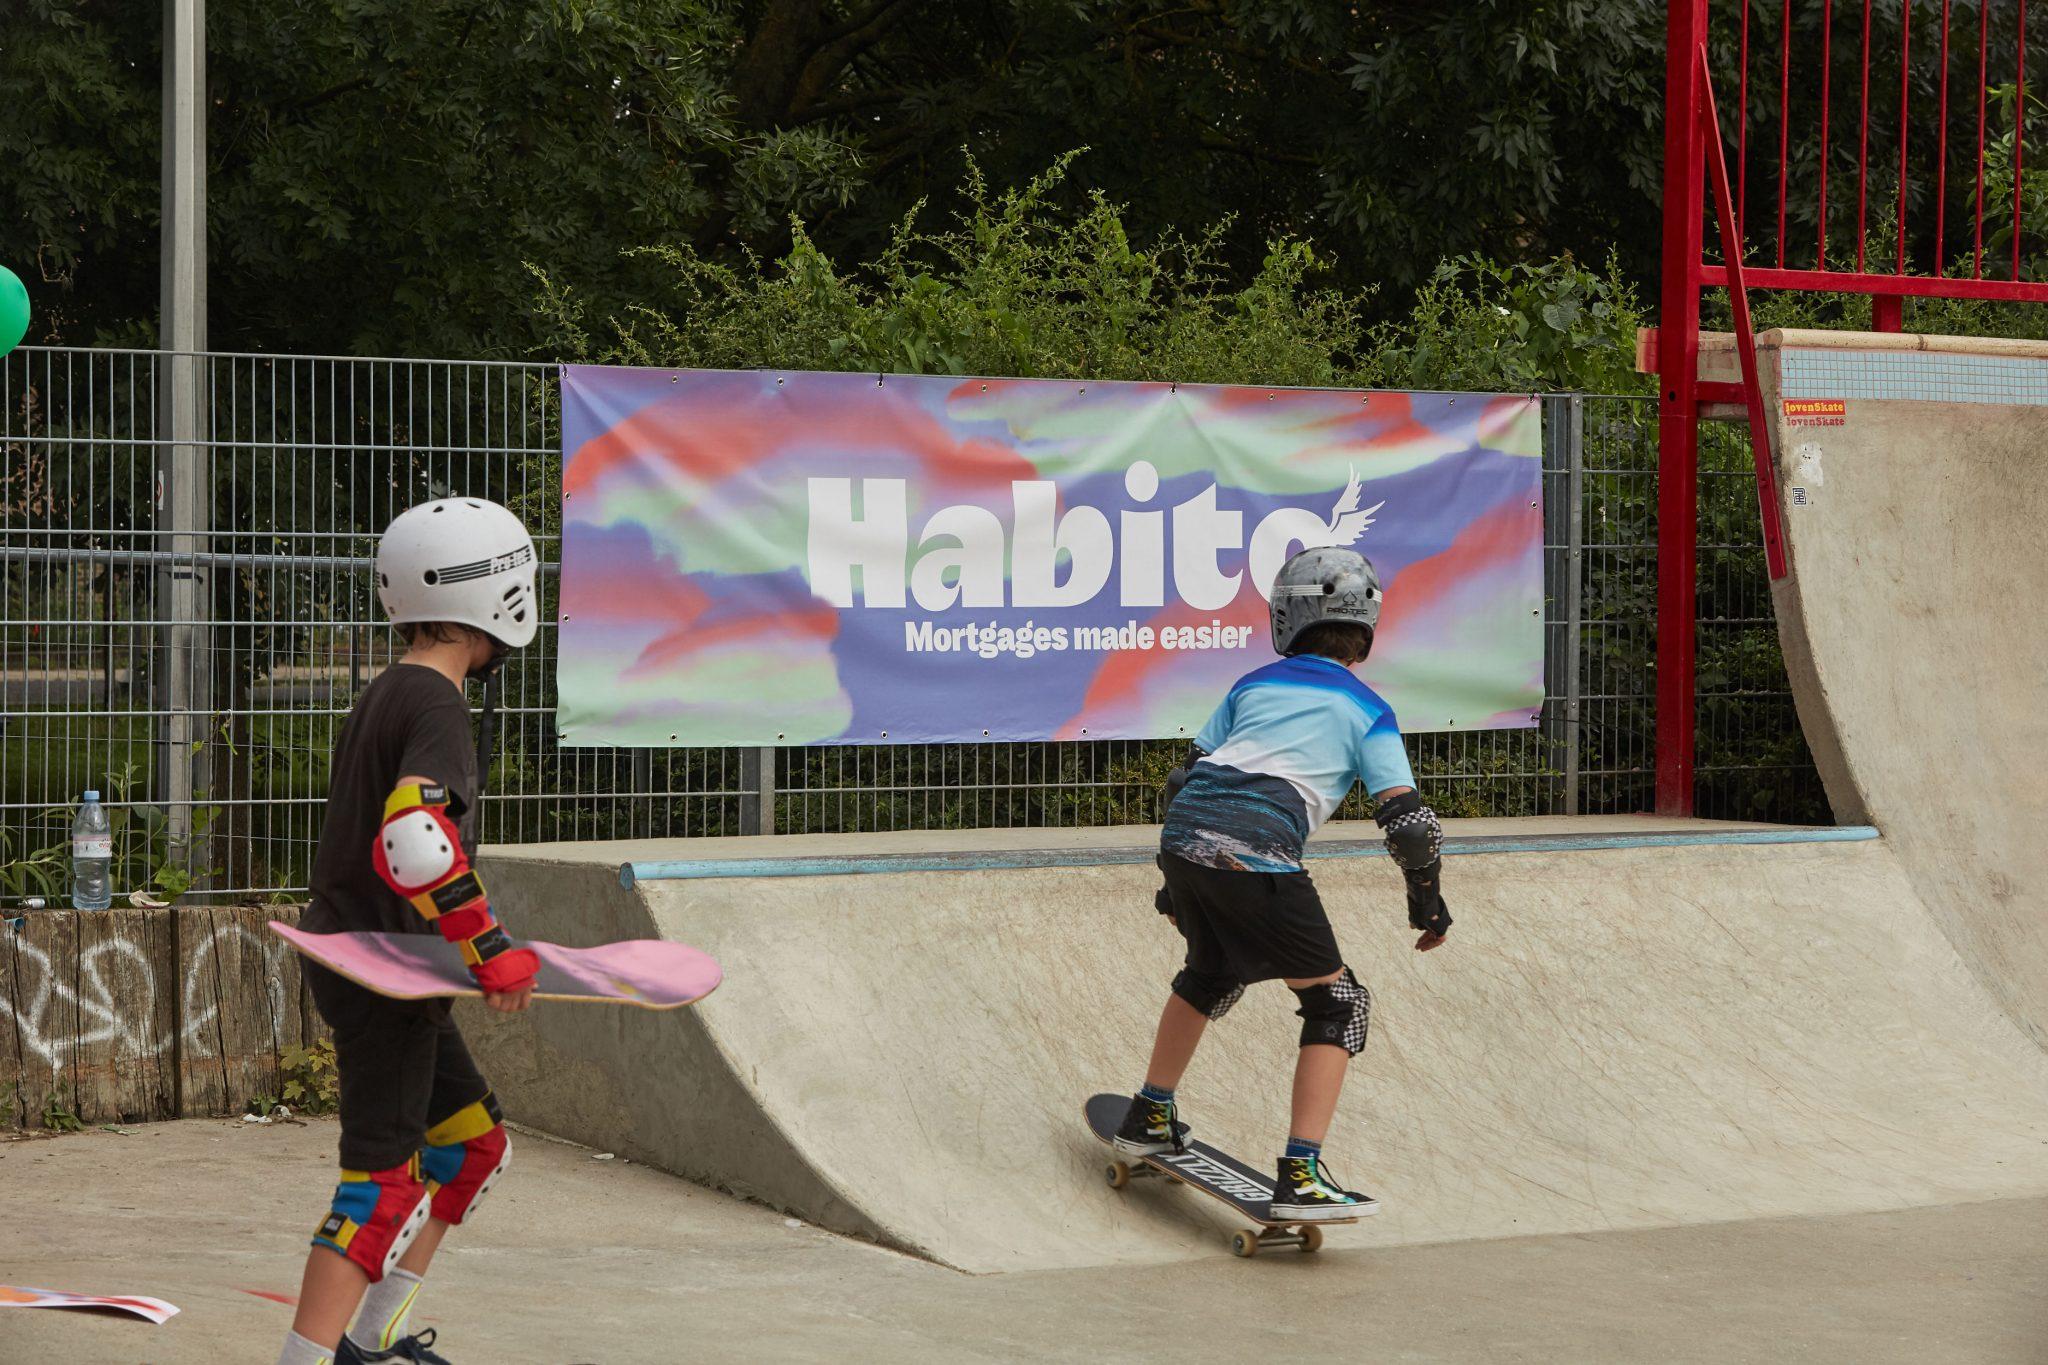 Children on skatepark with Habito branding in the background.